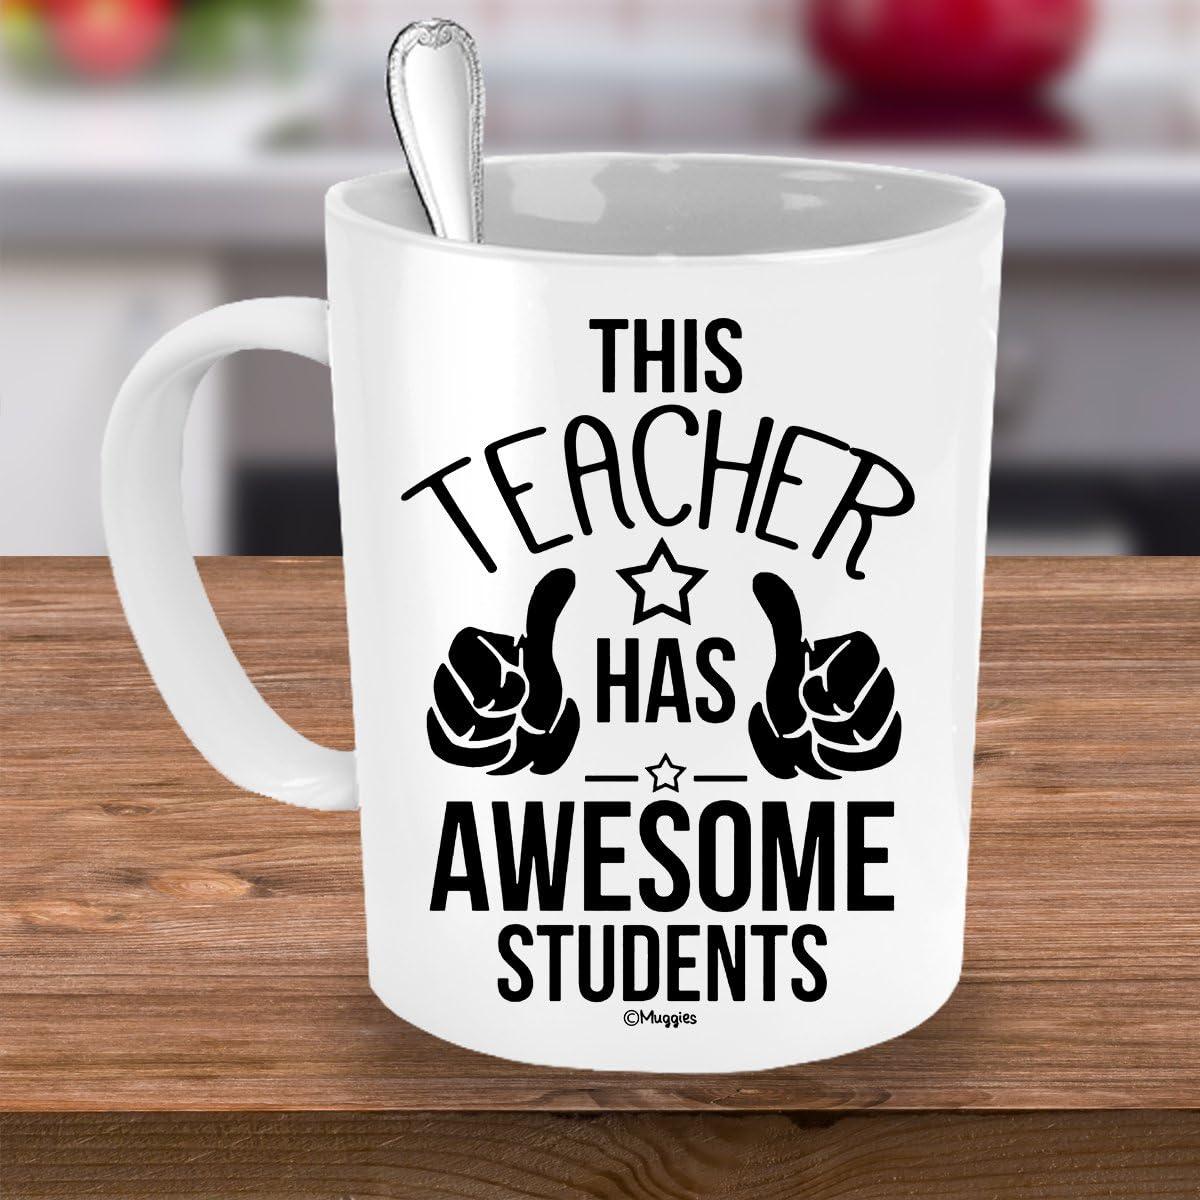 Unique Fun Christmas Muggies Teacher Has The Best Students Mug 11oz Xmas for Classroom School Teacher Mom Wife Funny Coffee Tea Cup Birthday